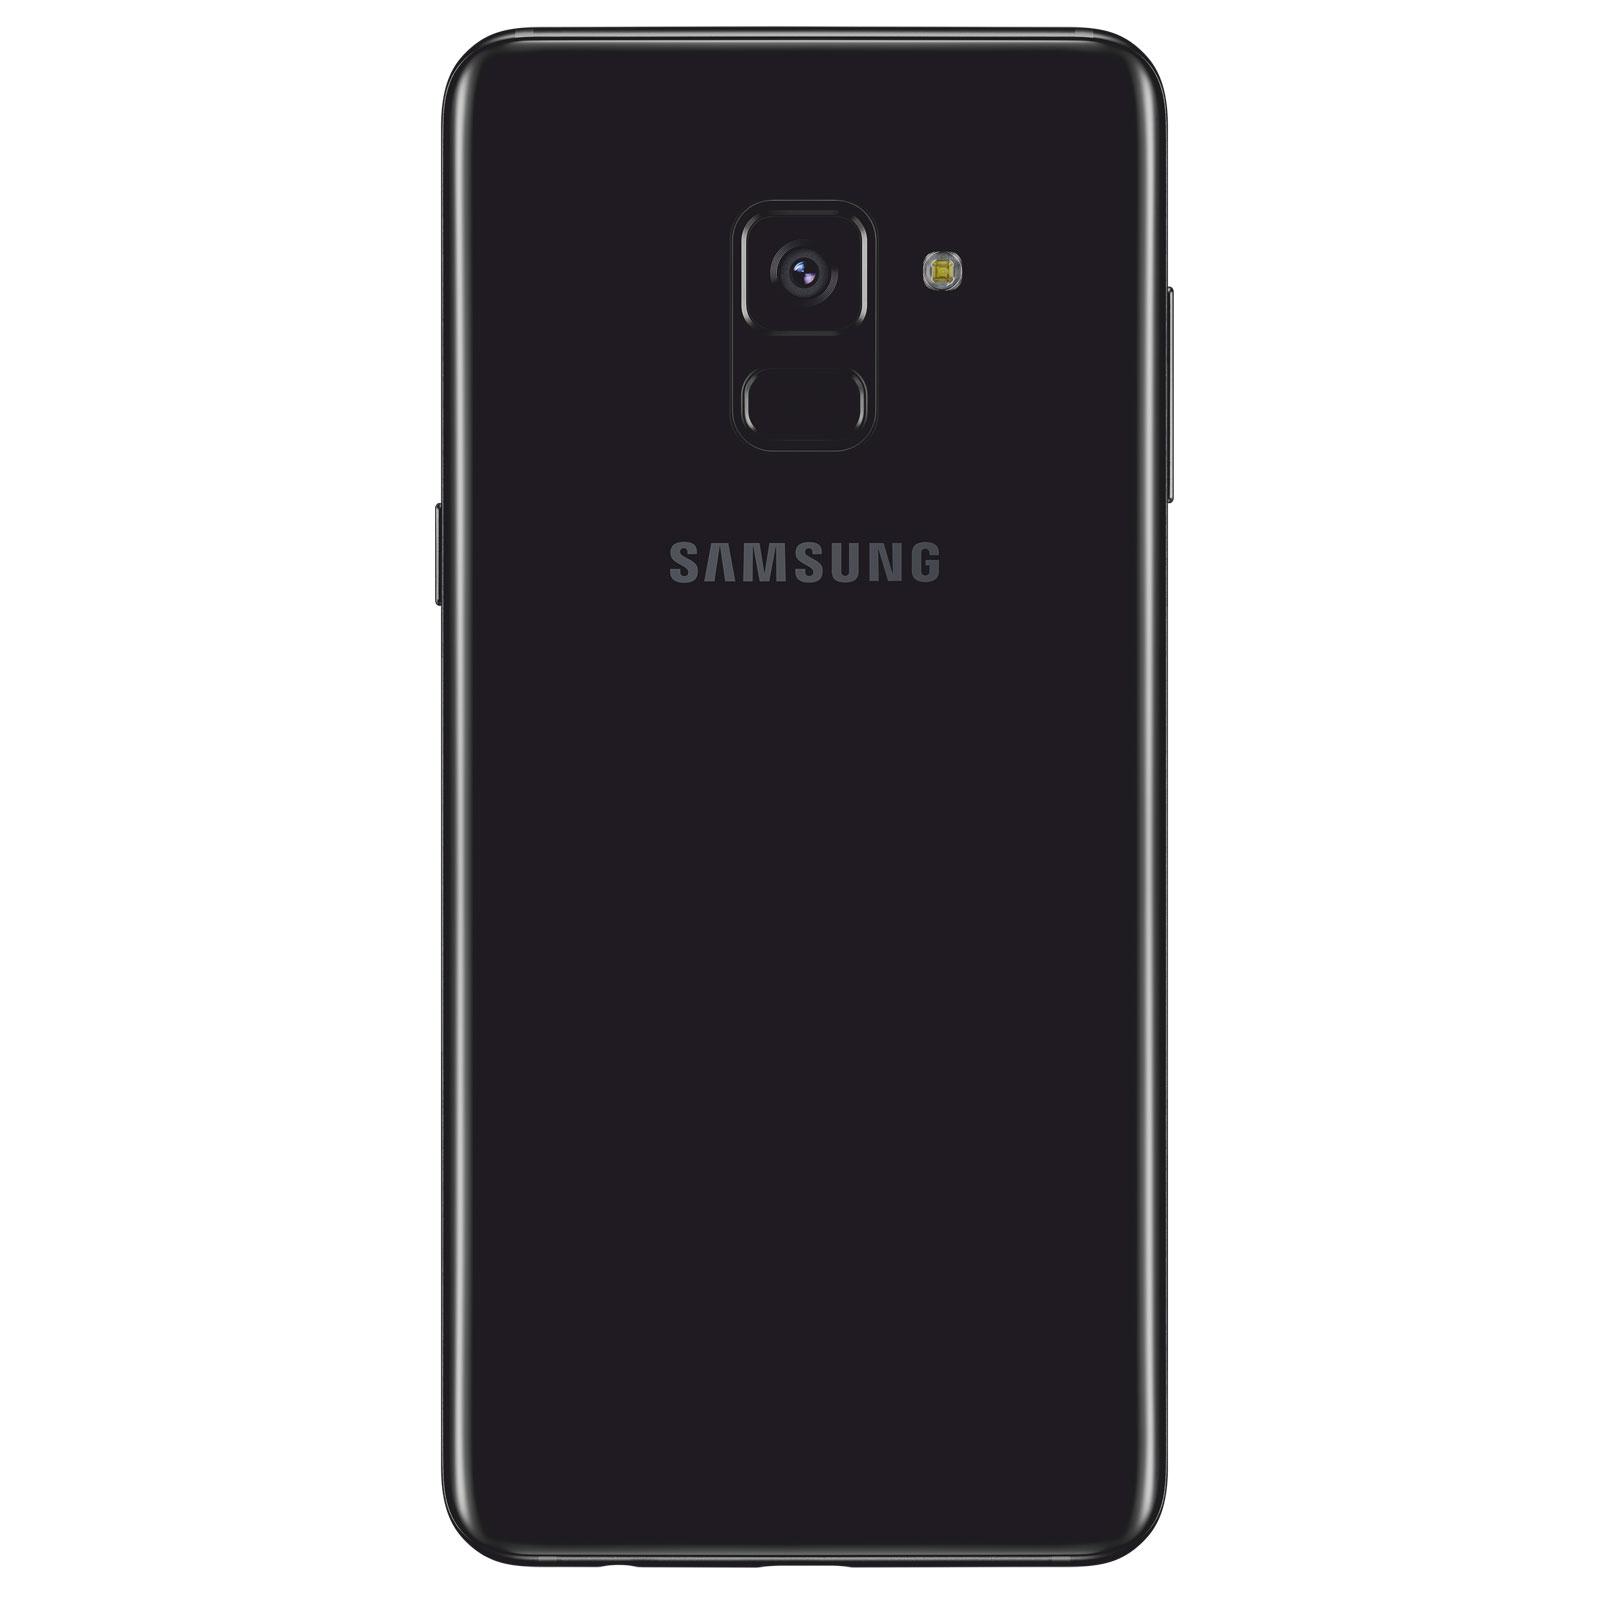 Samsung Galaxy A8 A530 32Go Noir Dual Sim (SM-A530FZKDXEF) - Achat / Vente Téléphonie sur Cybertek.fr - 1